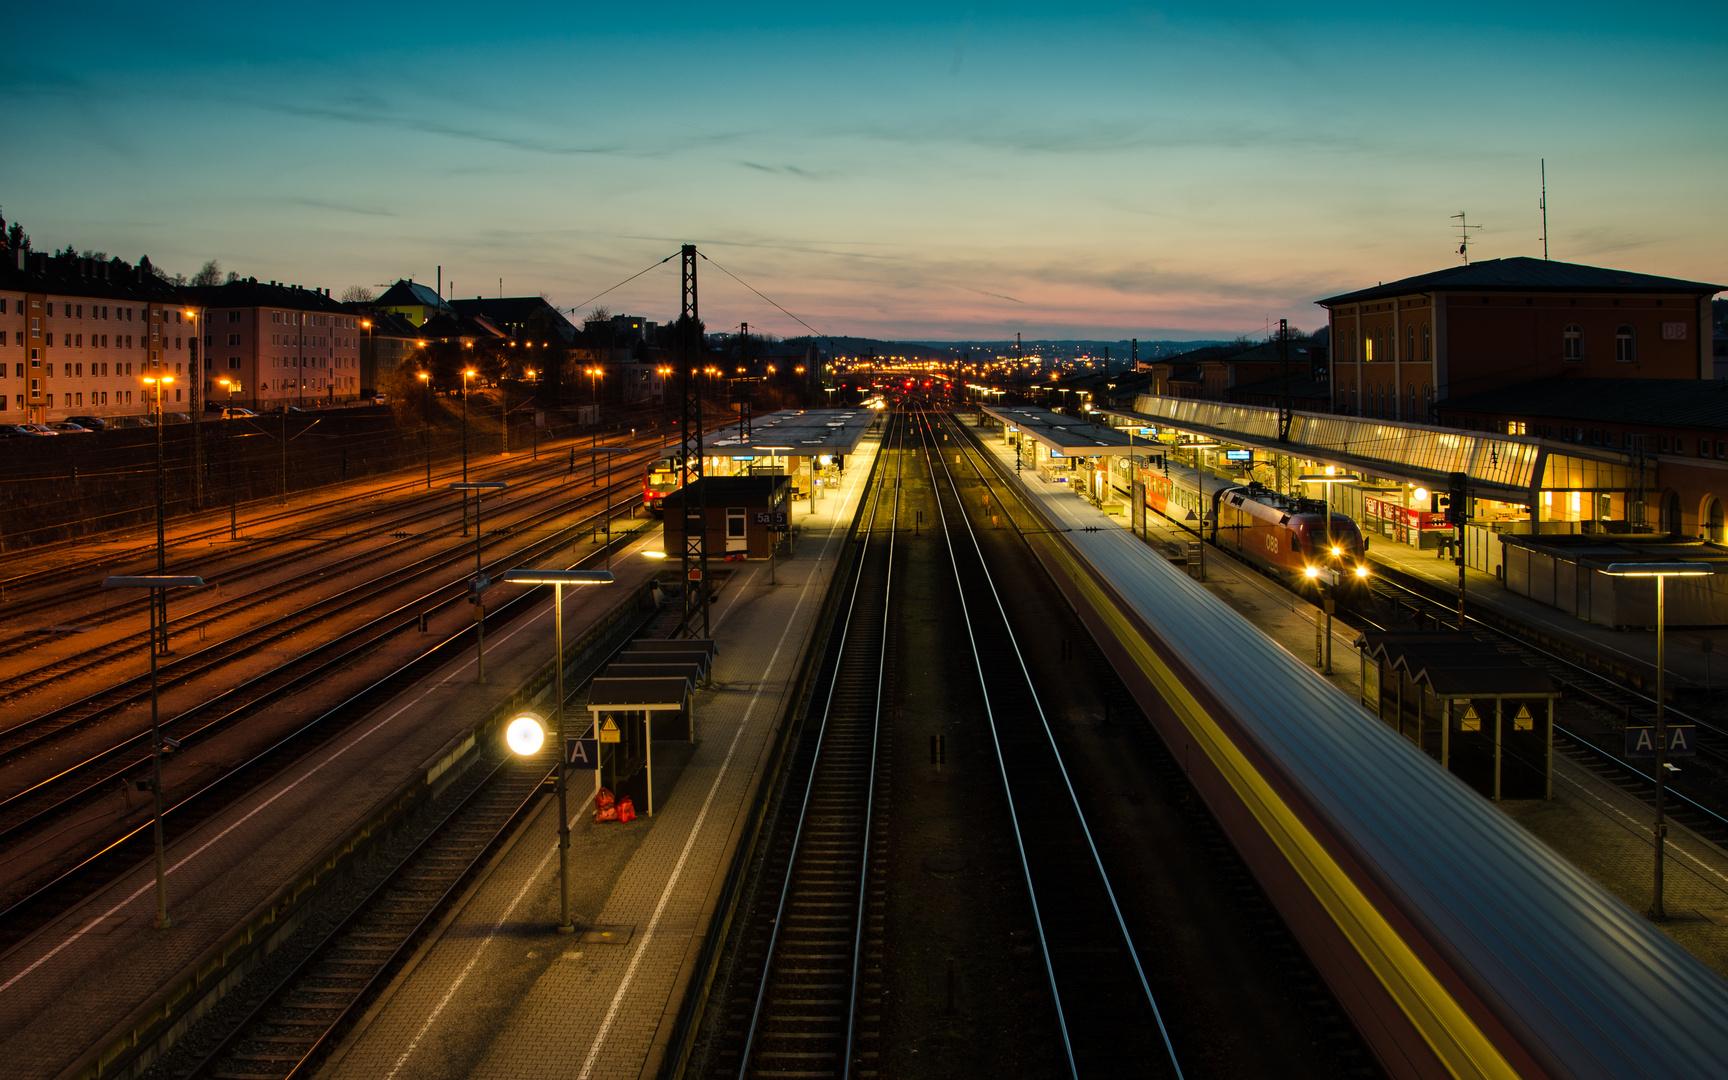 Bahnhof Passau